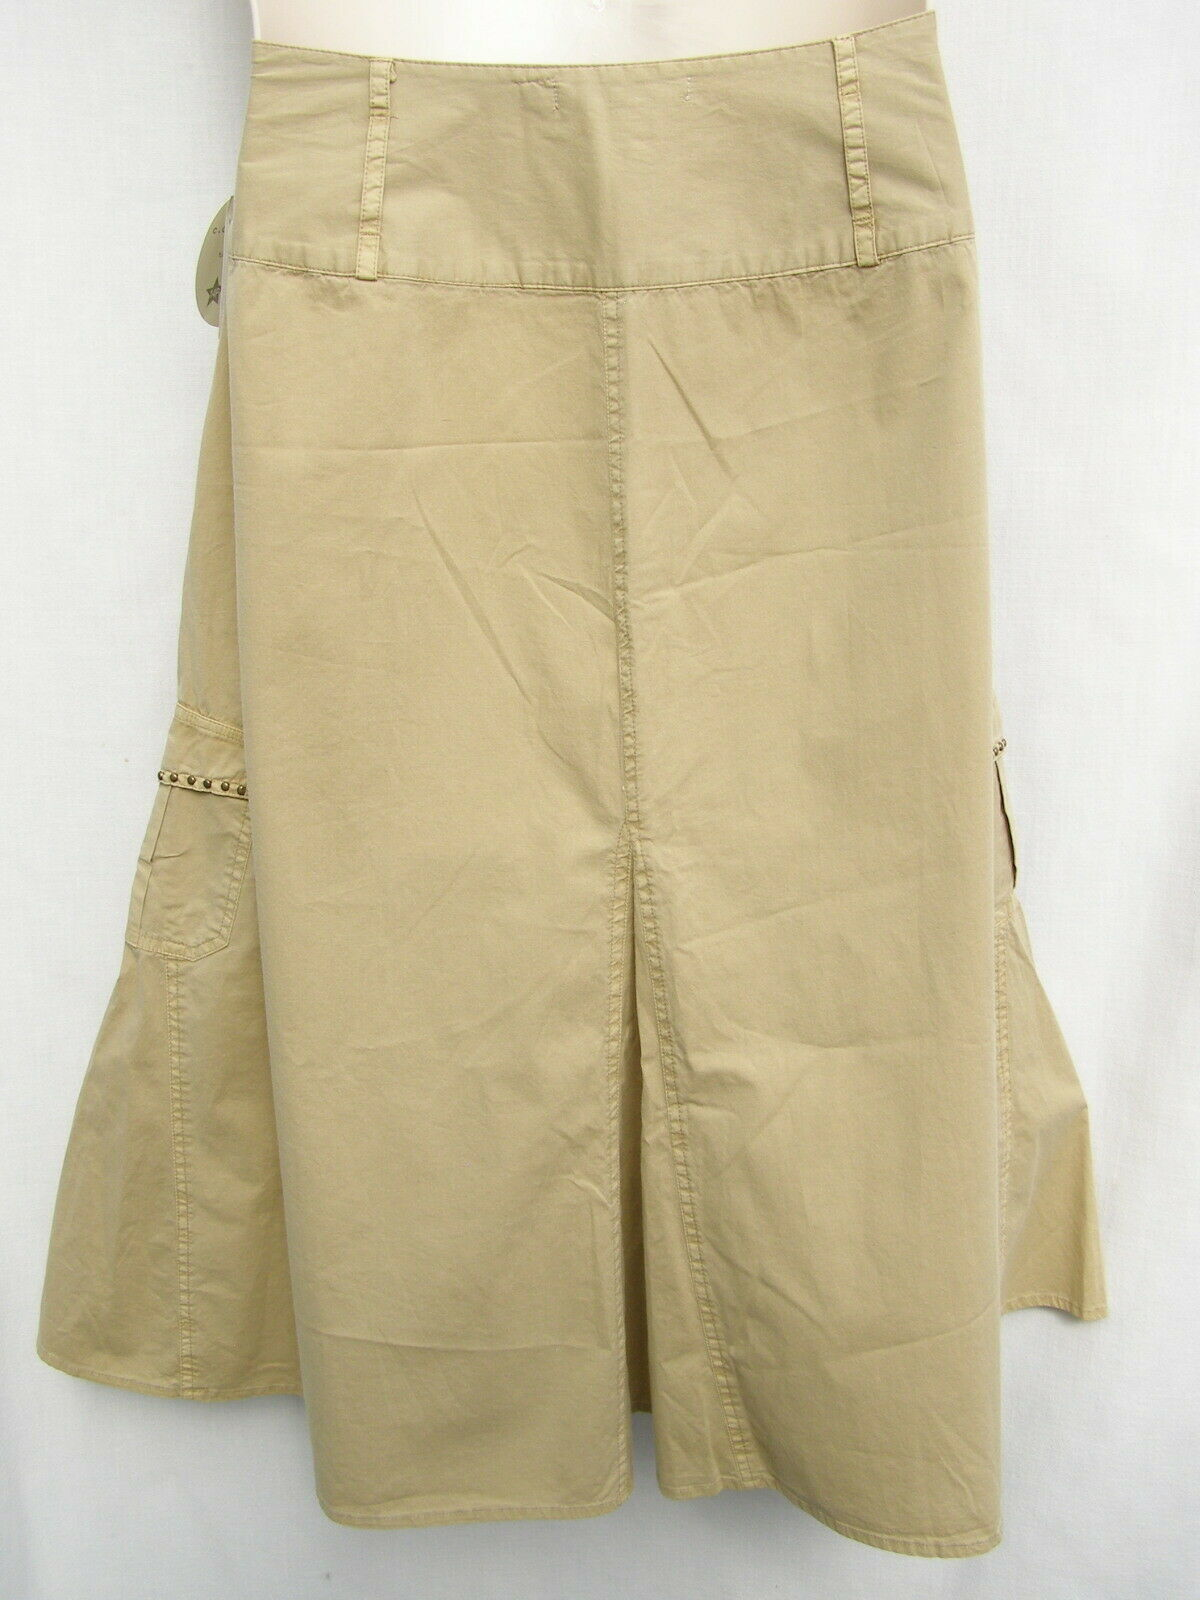 "CC Couture Circle Skirt Women's 14P New Khaki Latte 31"" Long Pockets Cotton NWT"